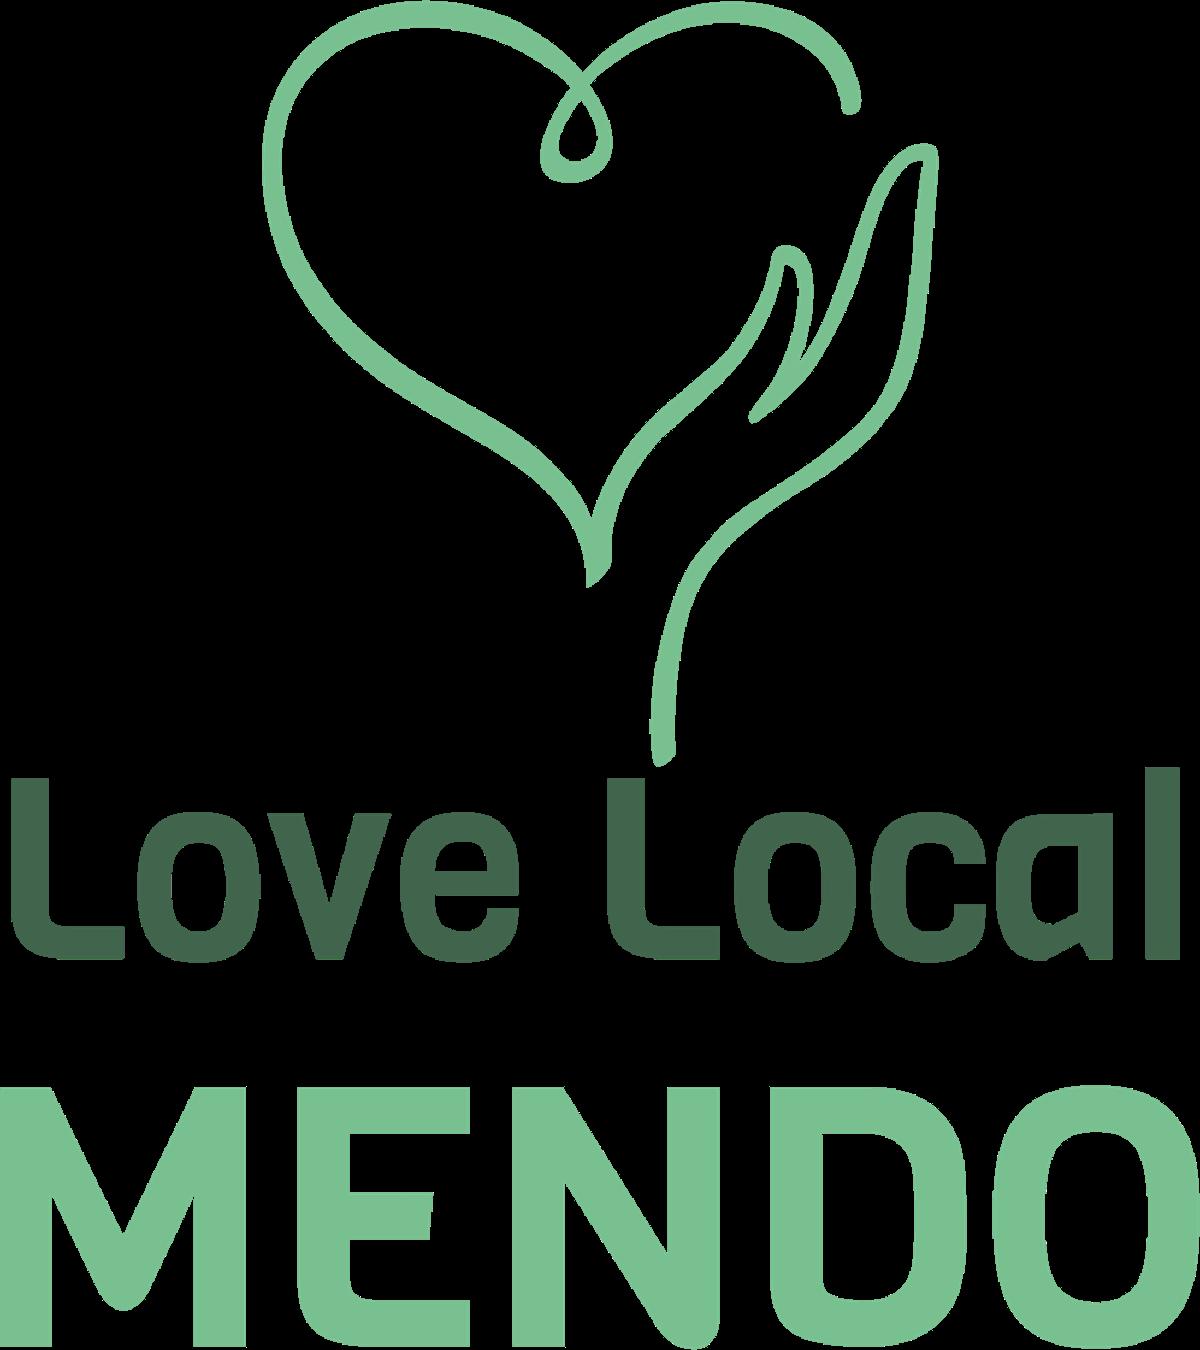 Love Local Mendo Digital Gift